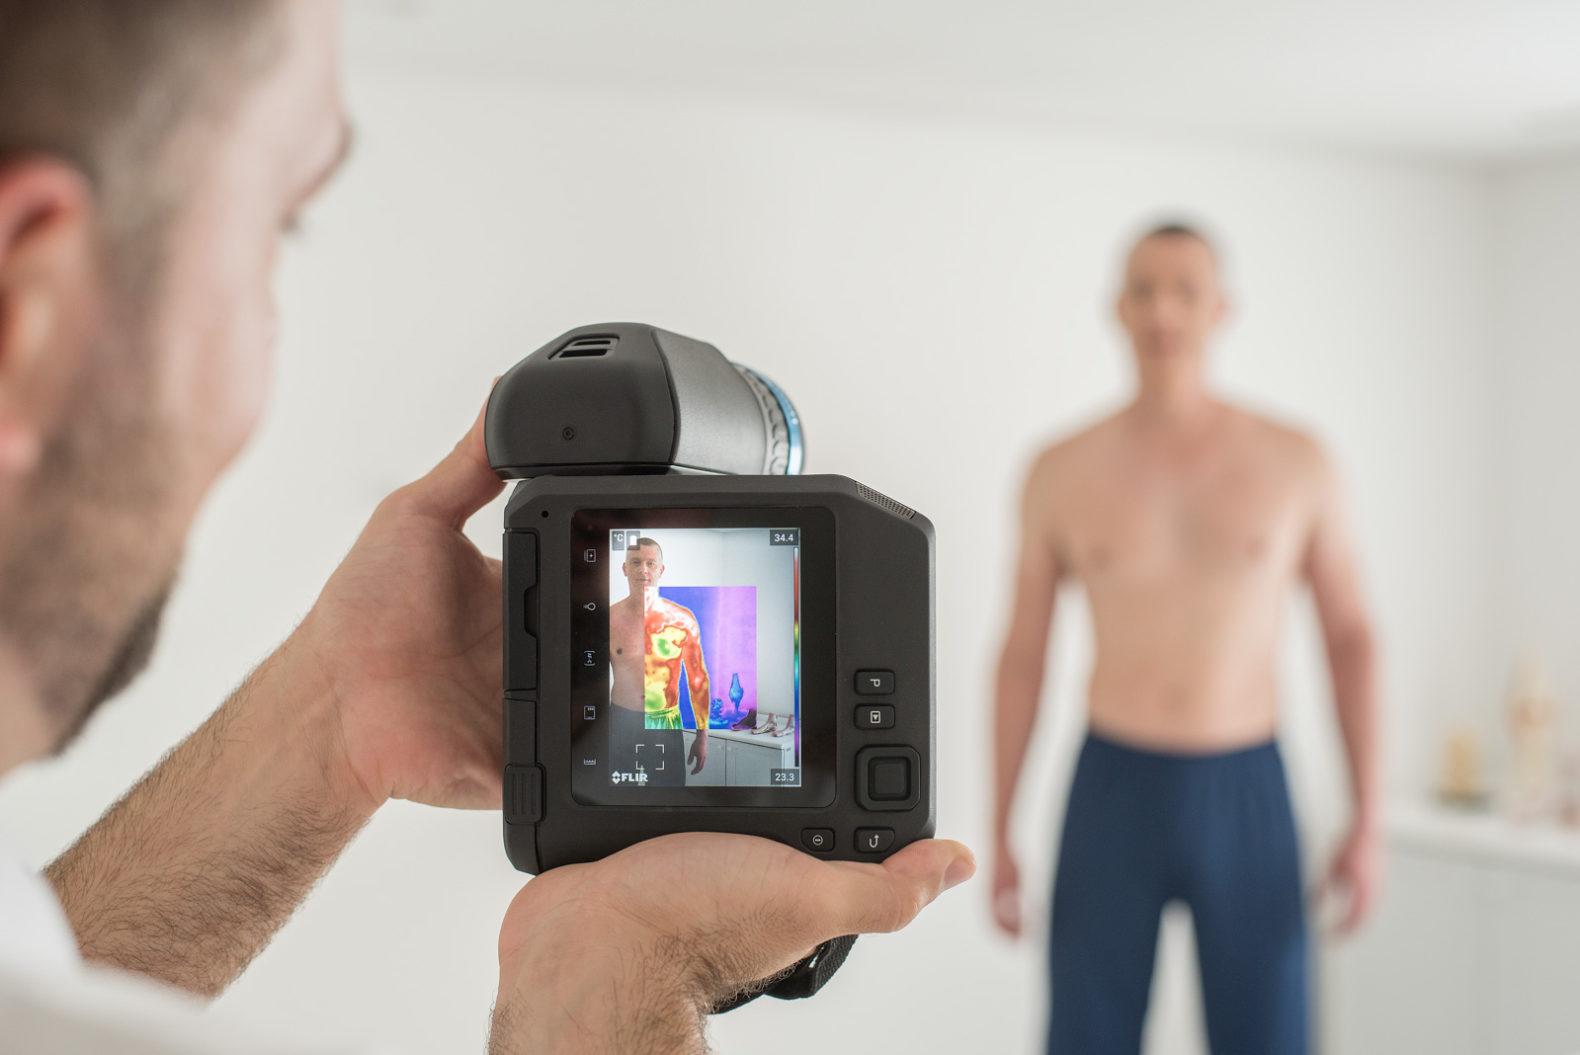 medical-check-thermal-camera-holistic-body-health-longevity-kurotel-medical-center-spa-braziljpg